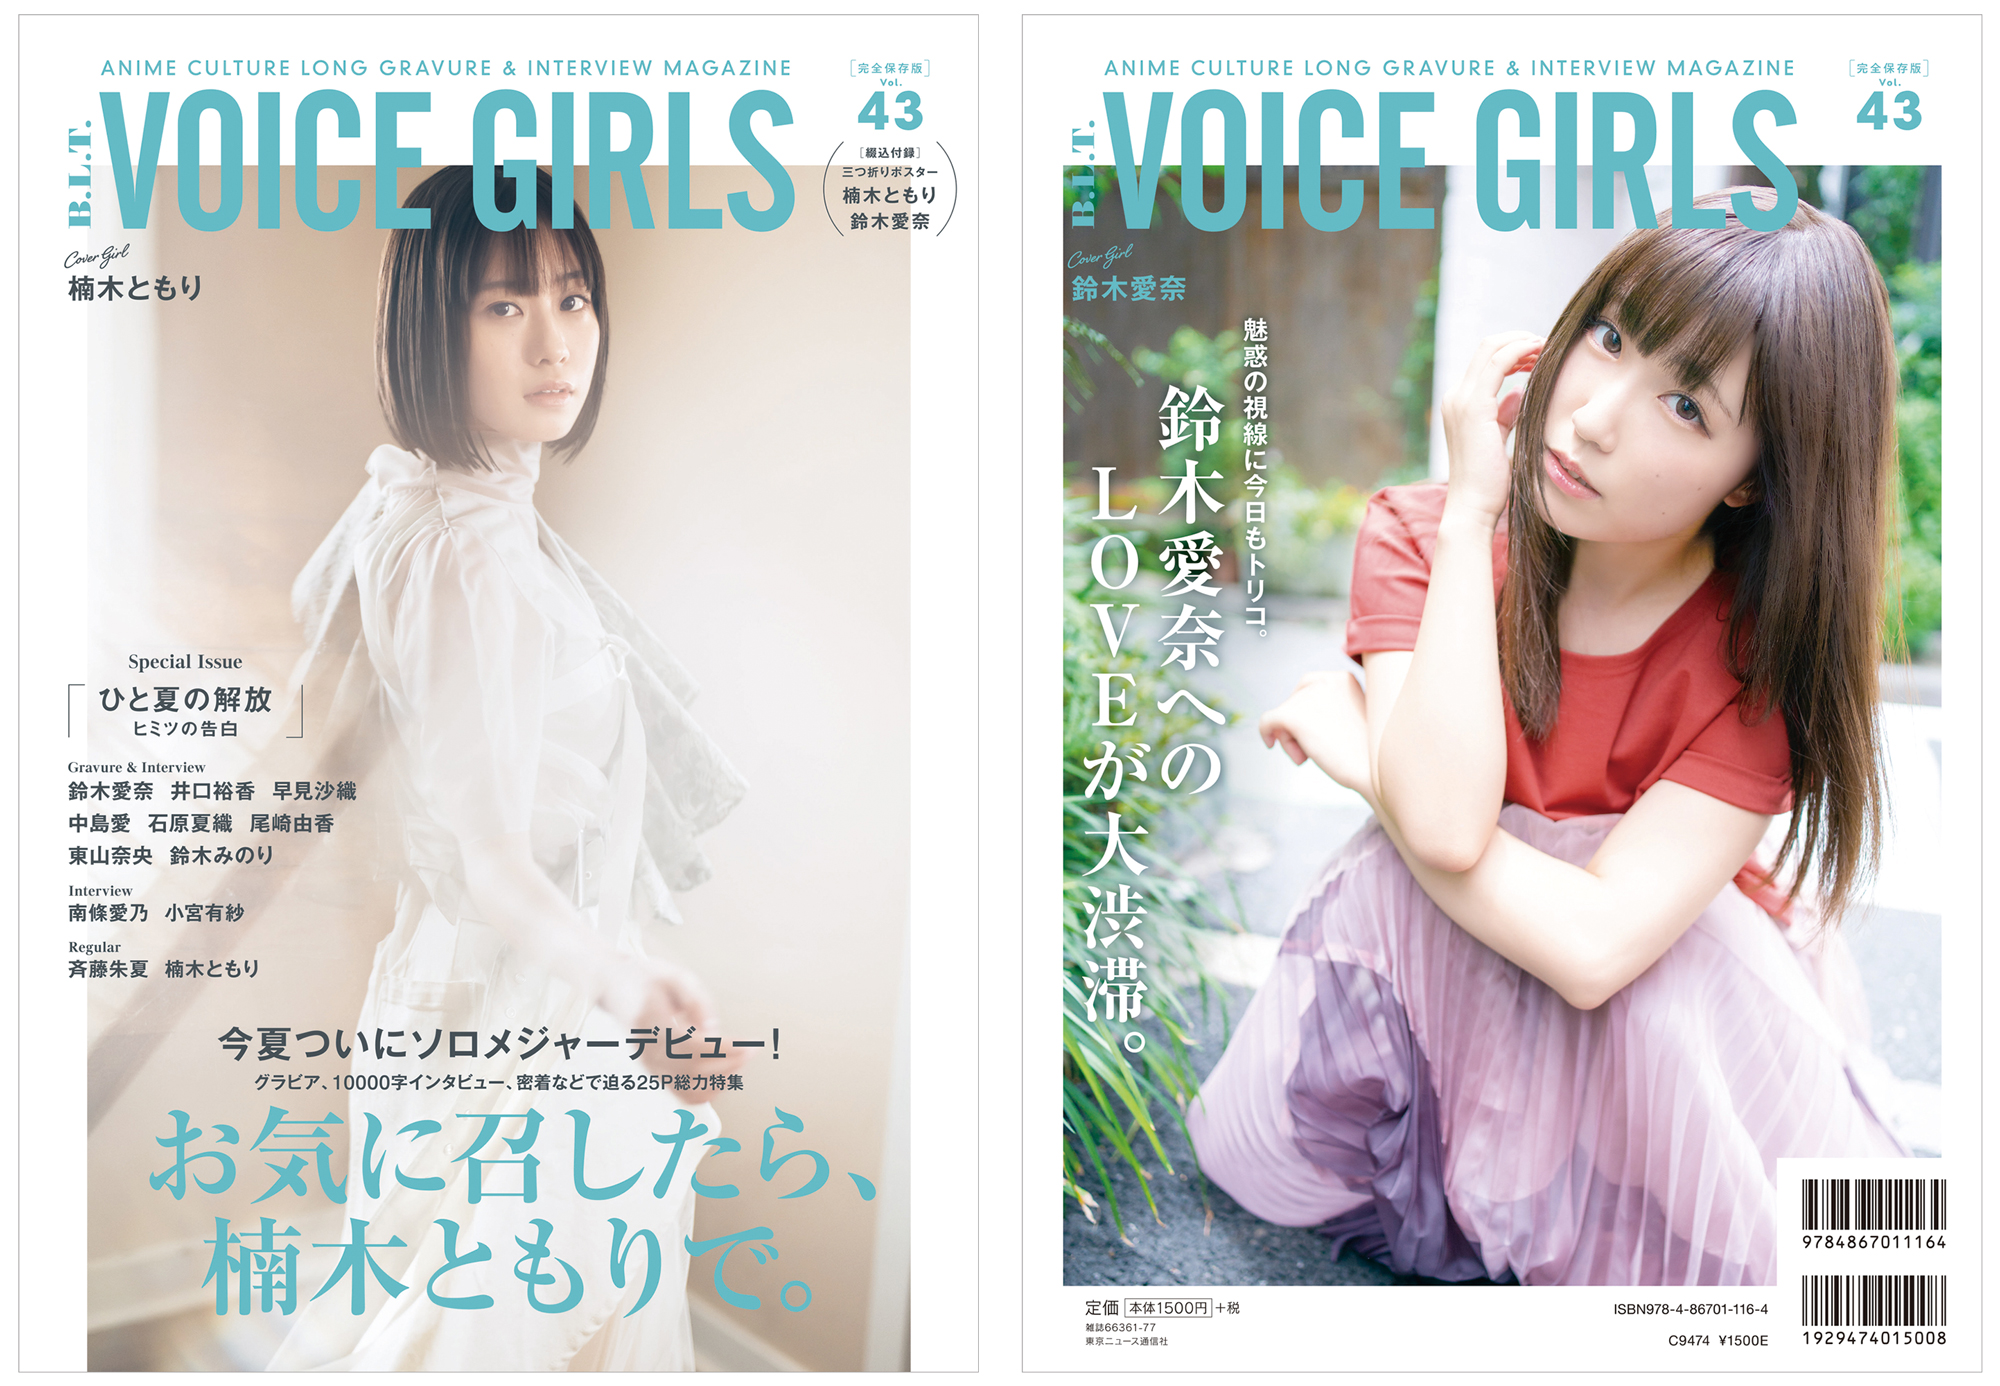 gravure.com 表紙 金のEX NEXT Vol.7 【表紙】 仲村美海 (ミリオンムック)